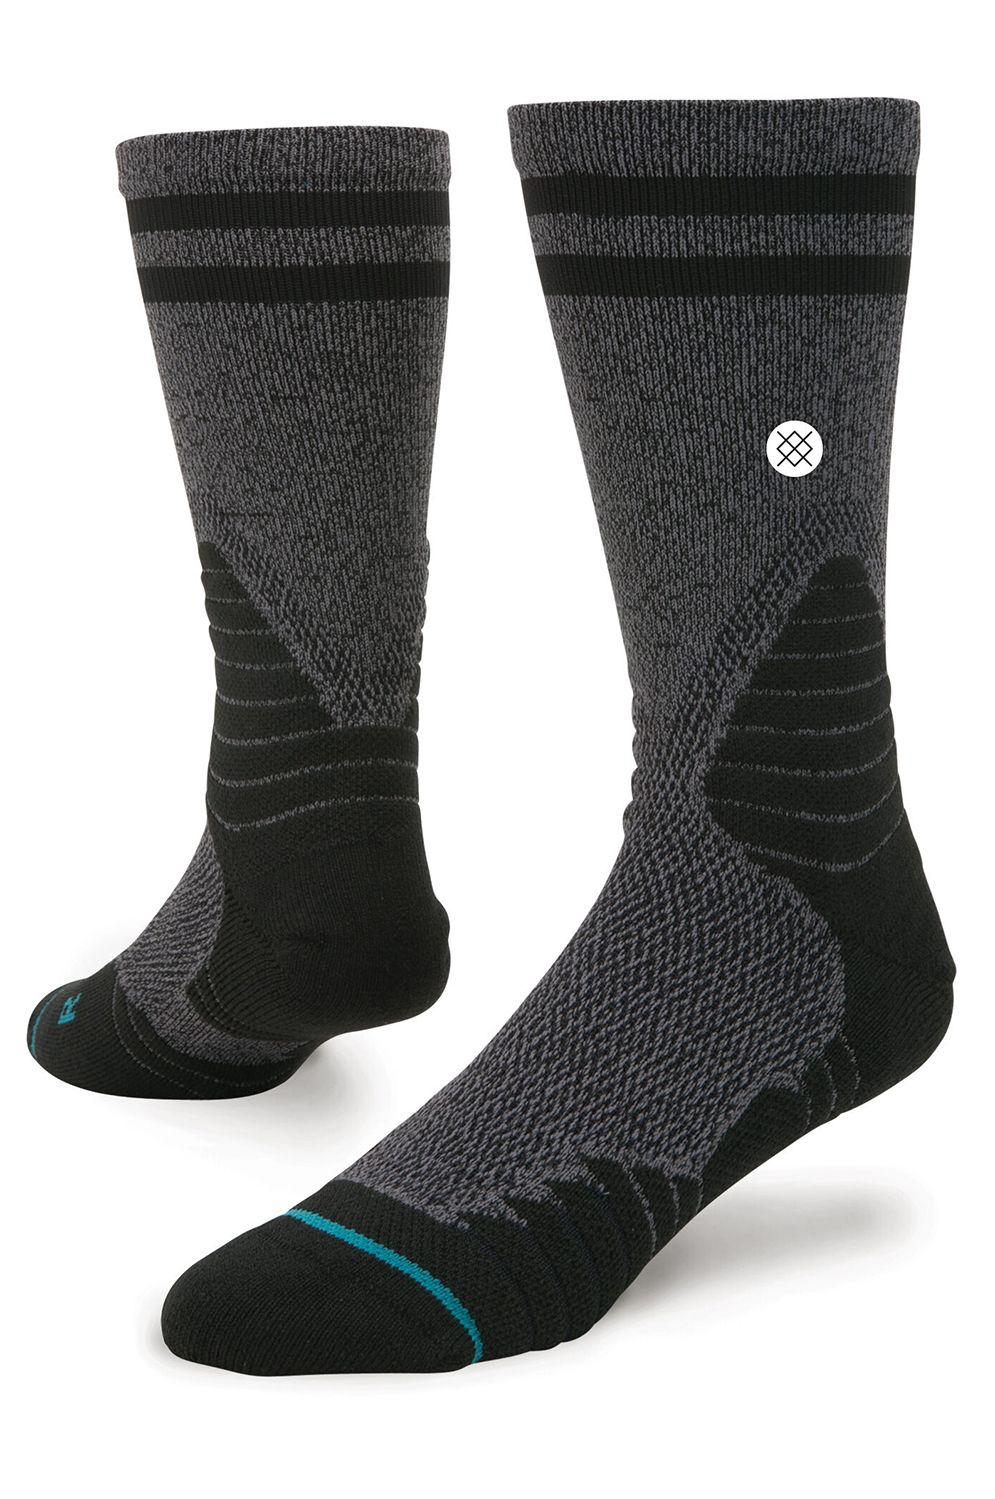 Stance Socks GAMEDAY Black